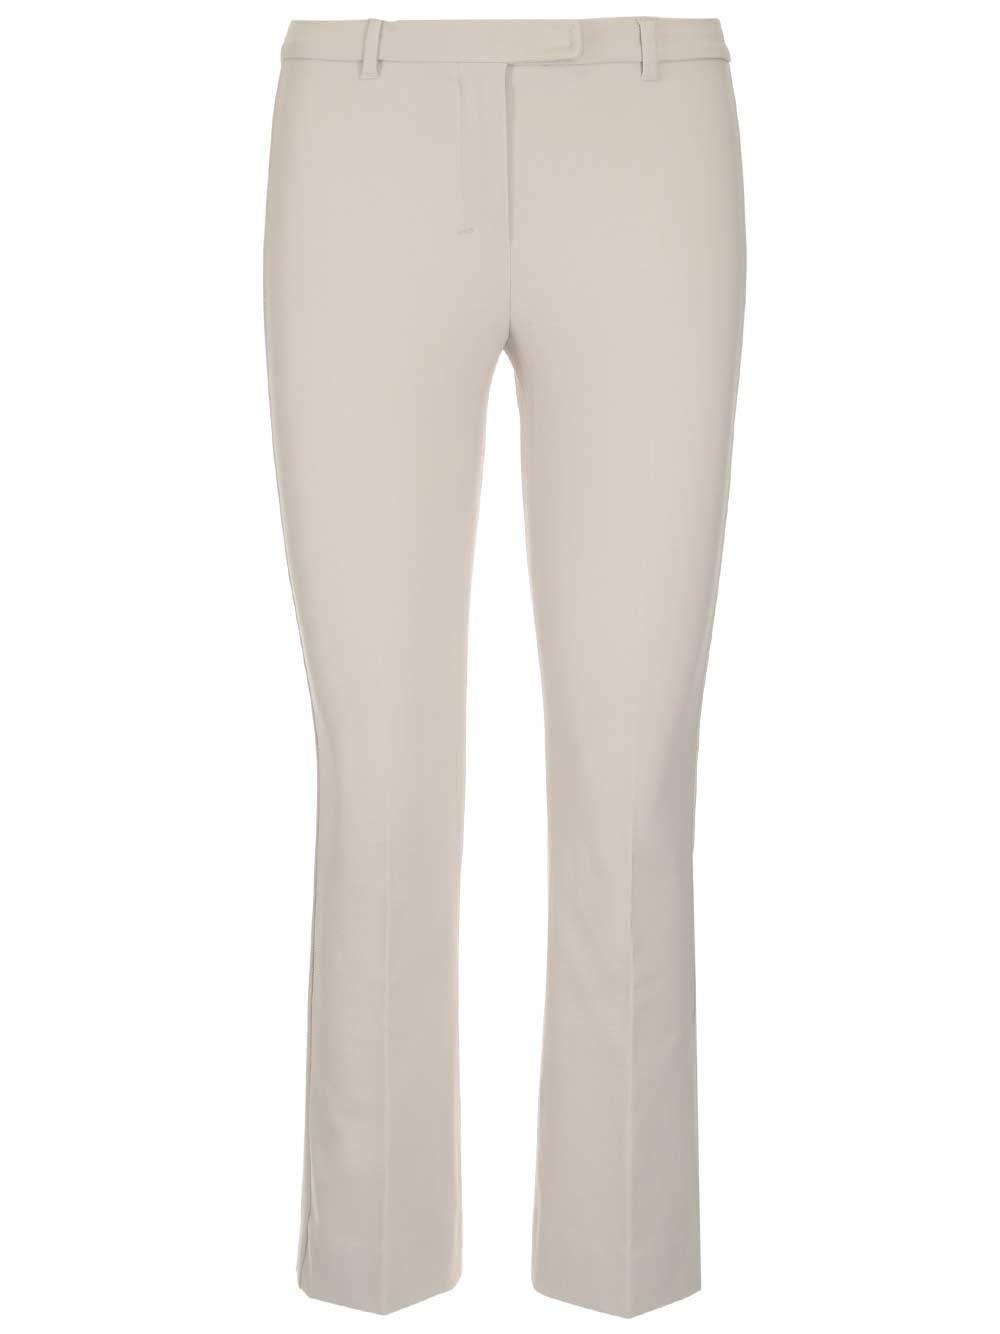 'S MAX MARA Cotton Satin Trousers